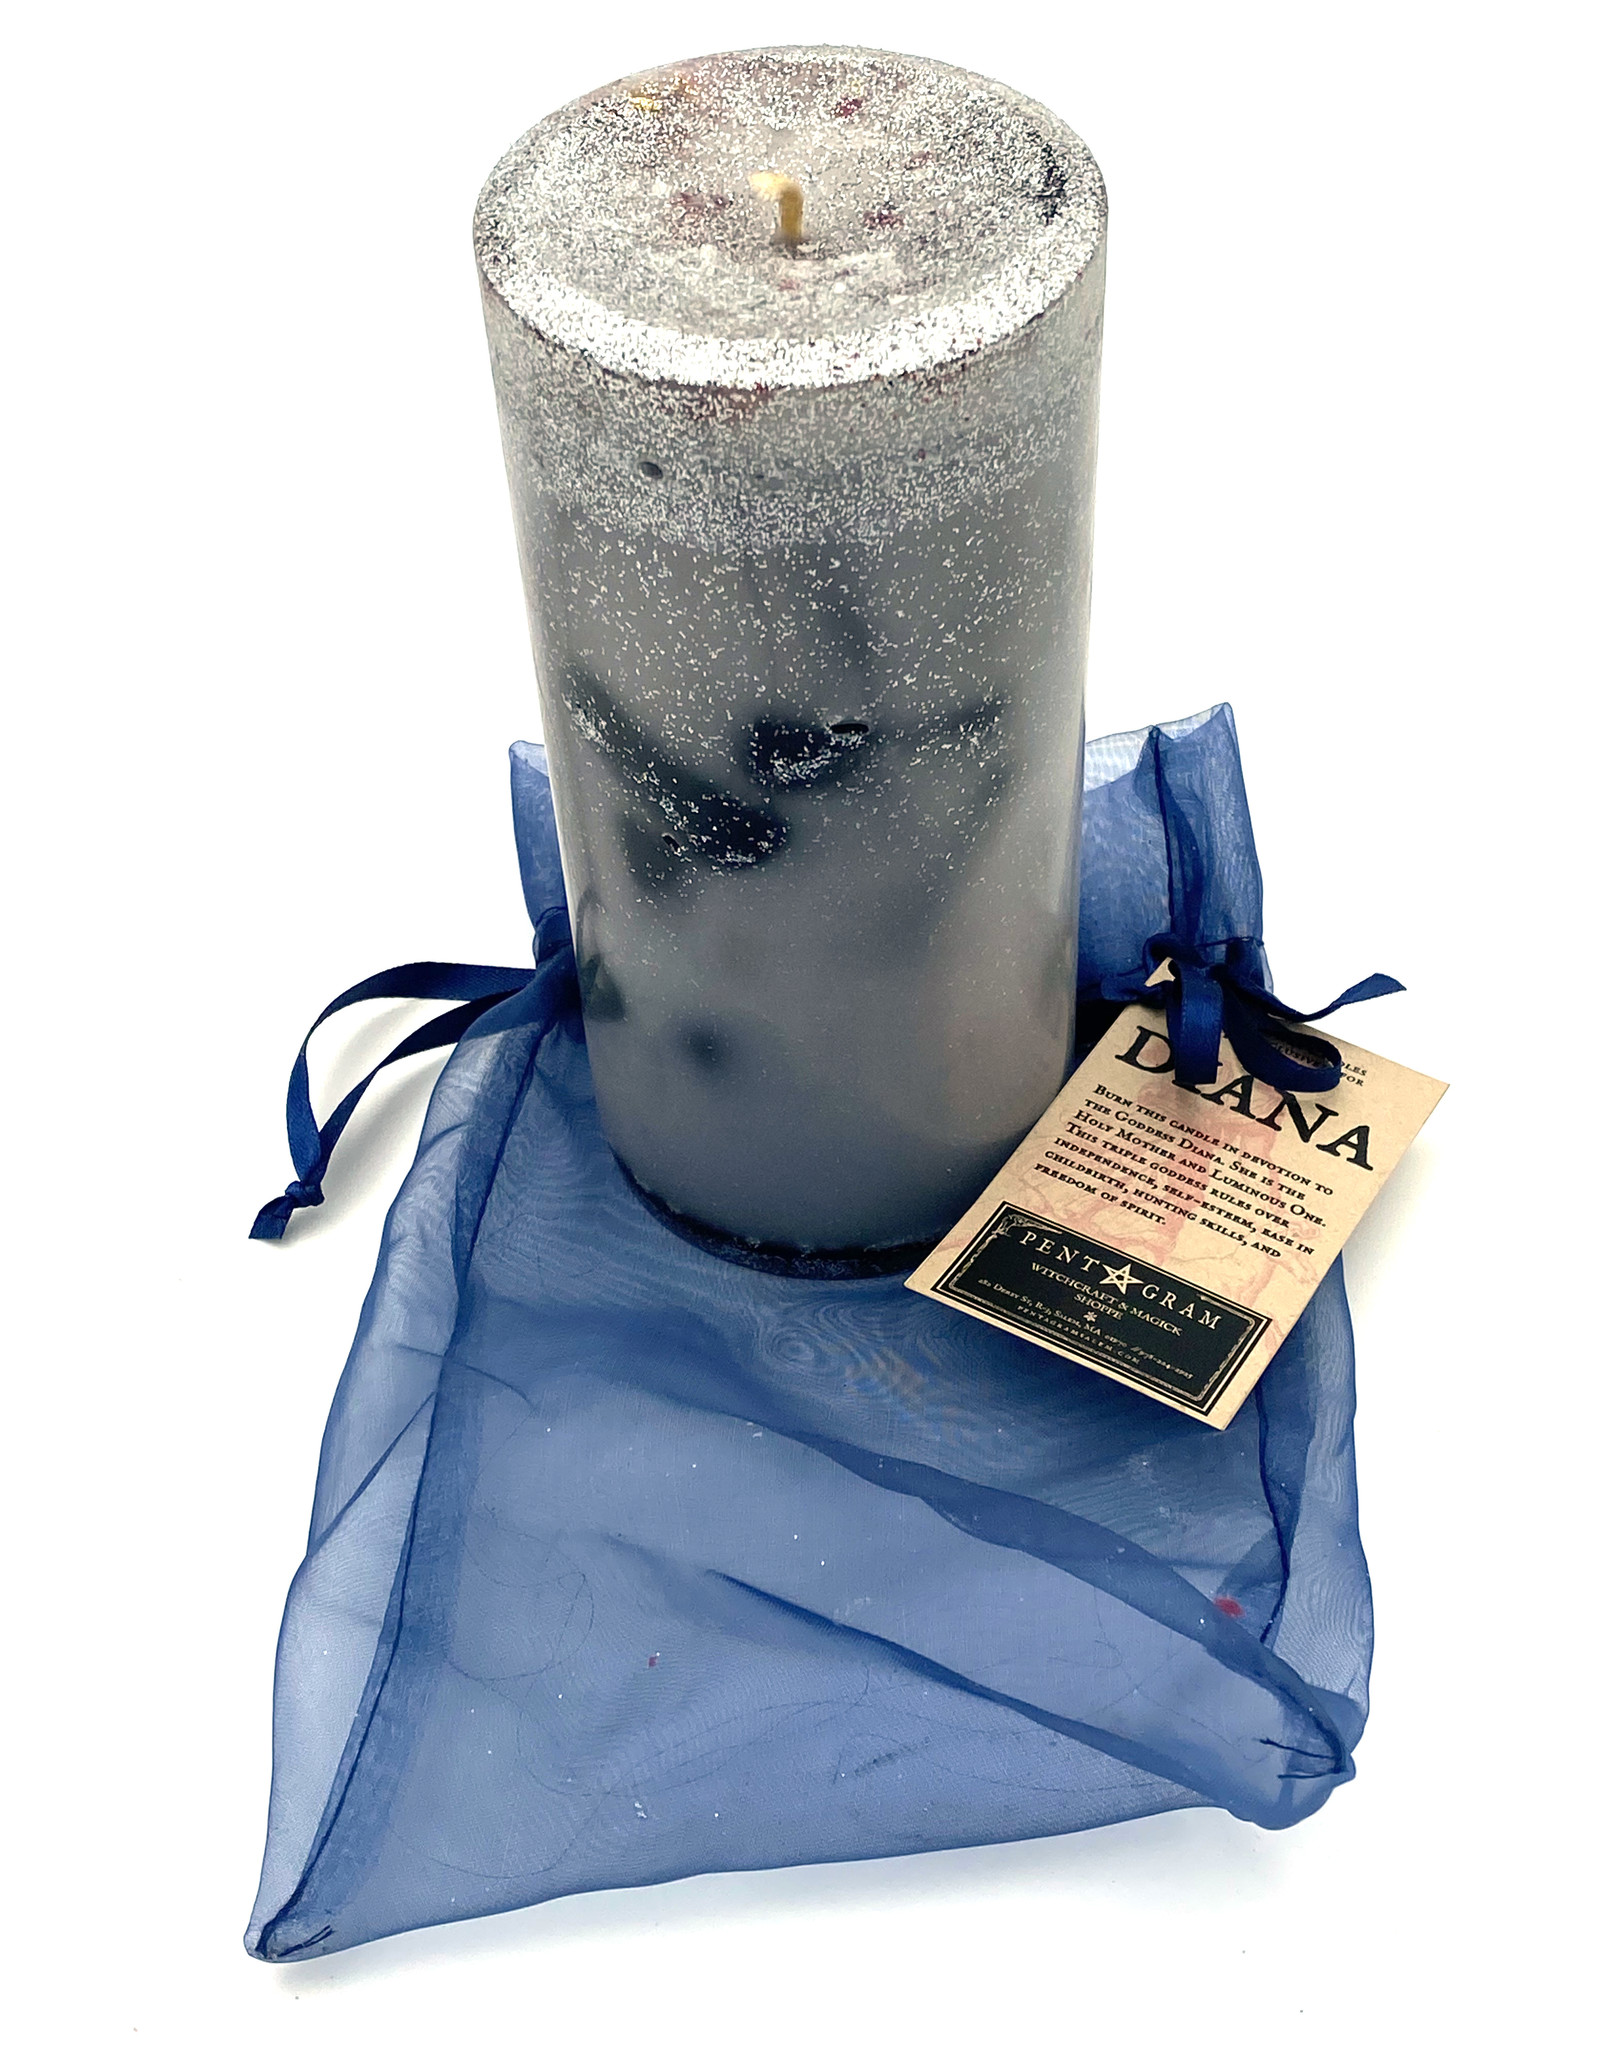 Diana Handmade Candle